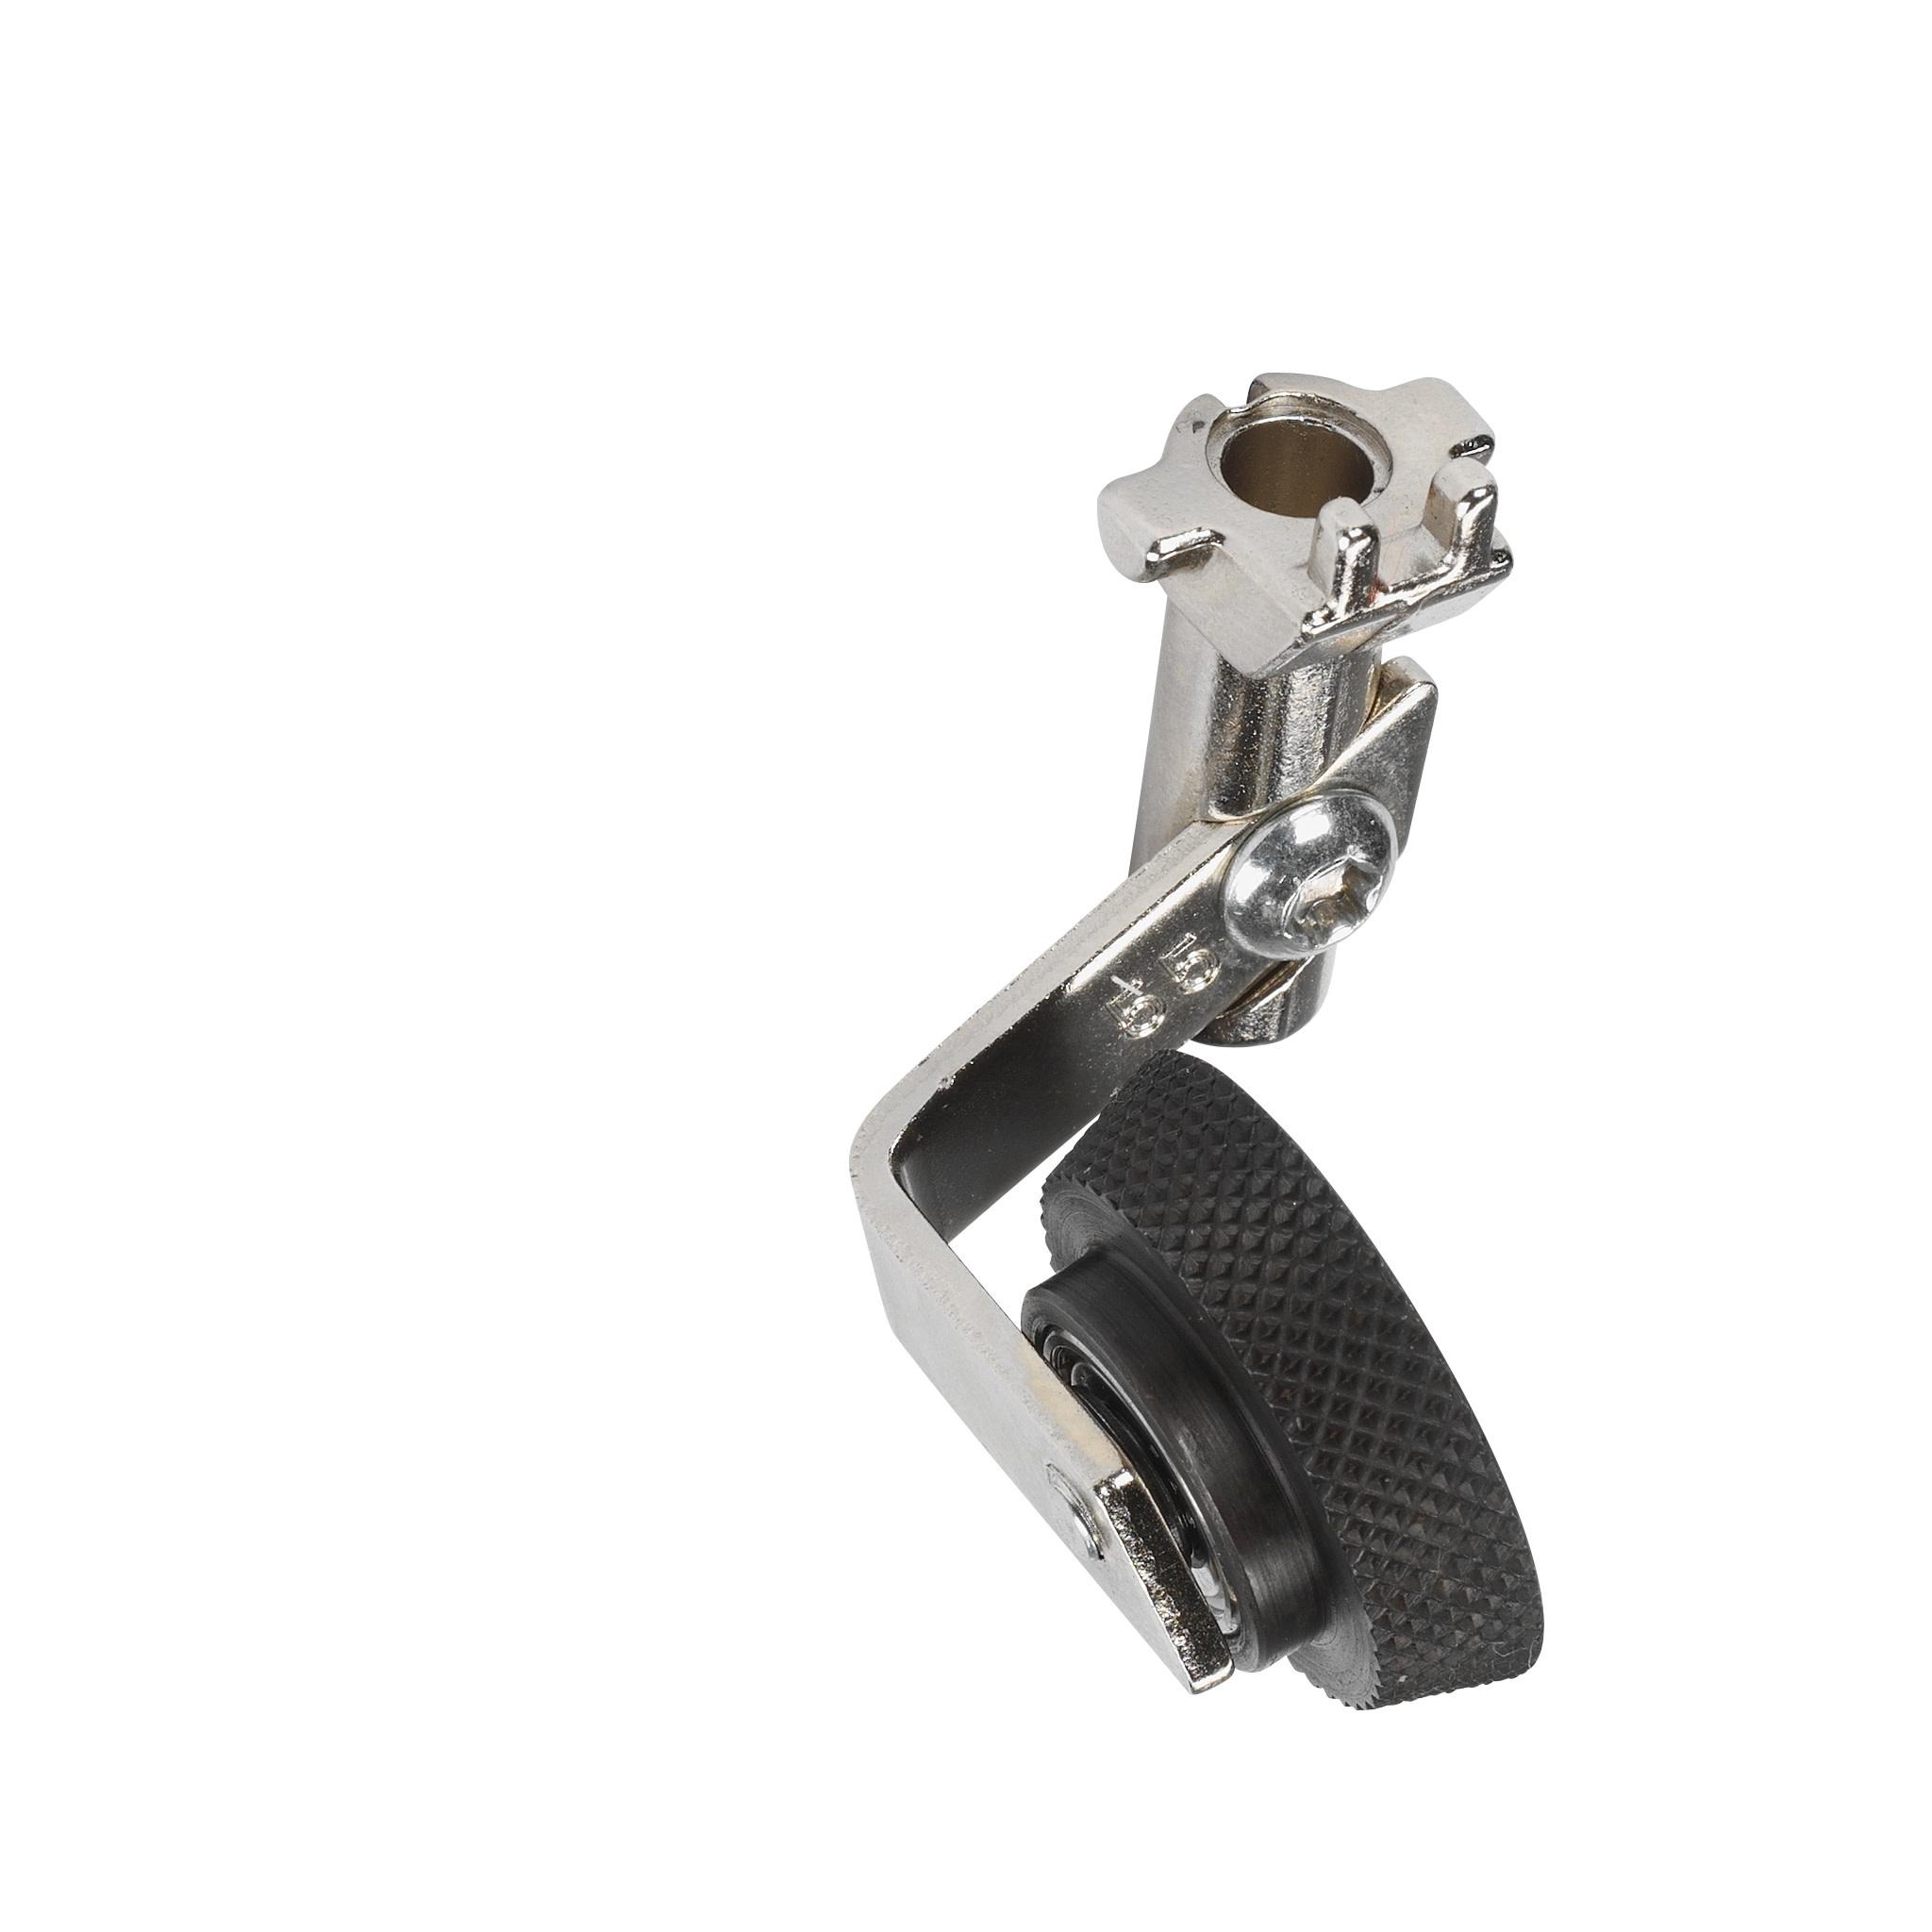 BERNINA Bernina #55 Leather Roller Foot